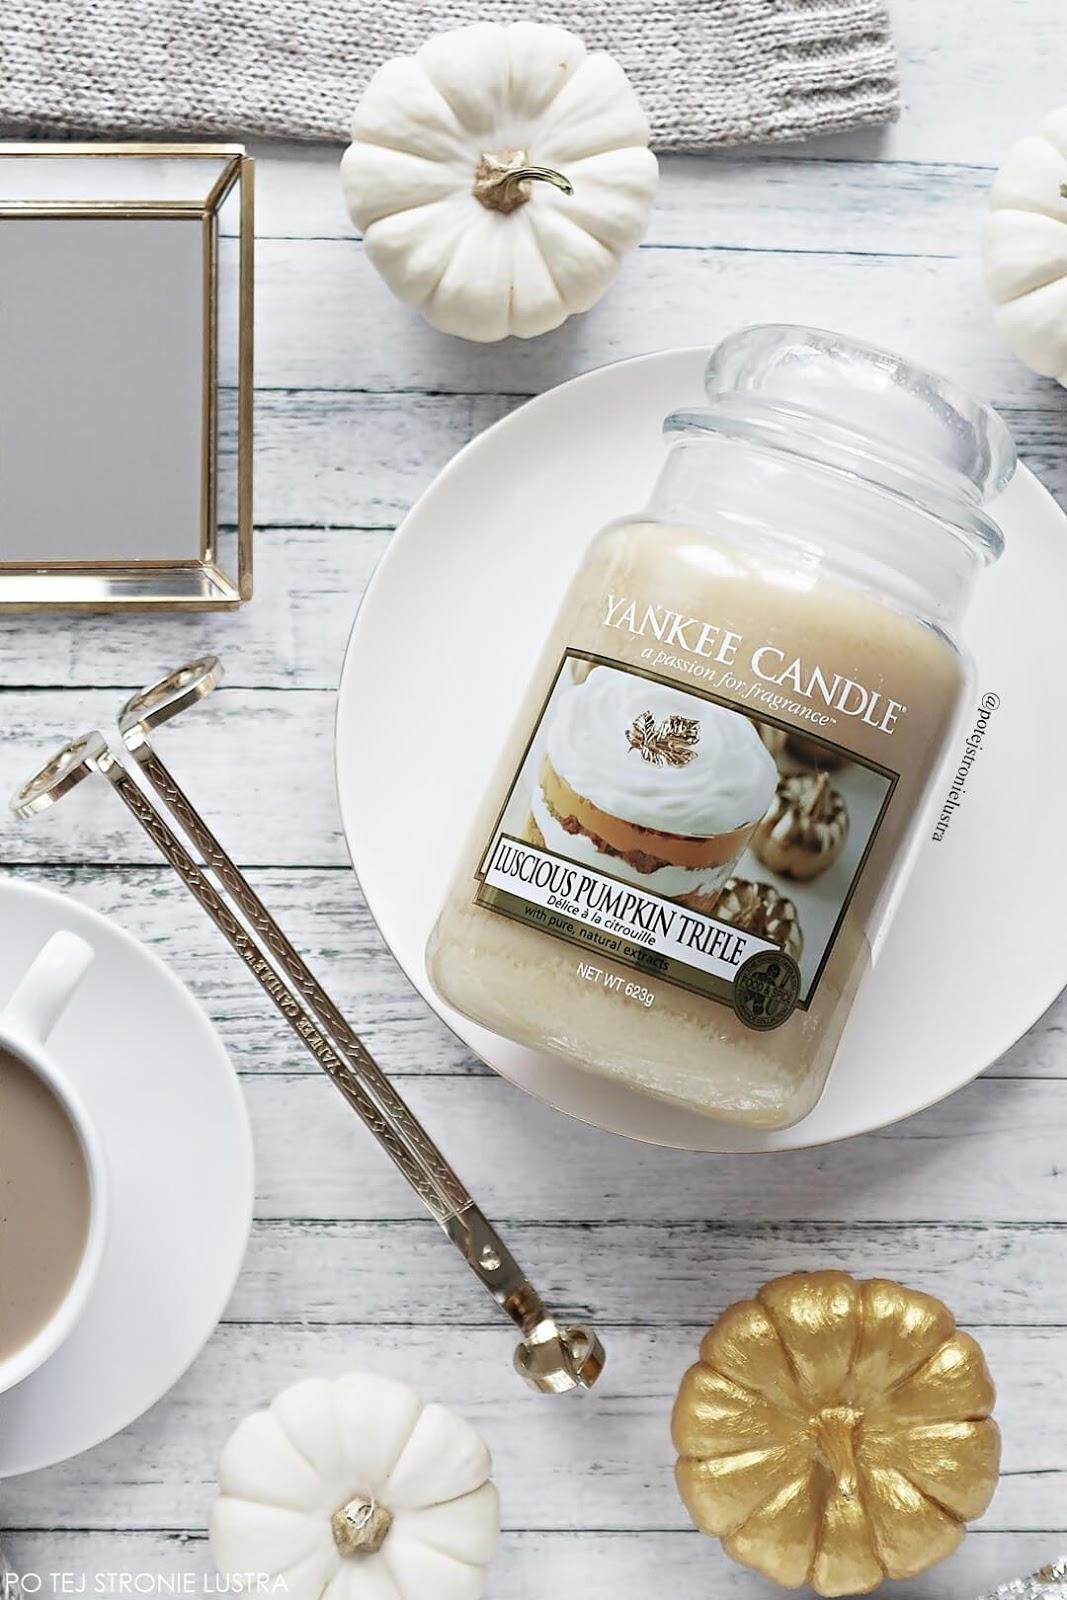 yankee candle luscious pumpkin trifle limitowany zapach na jesień 2018